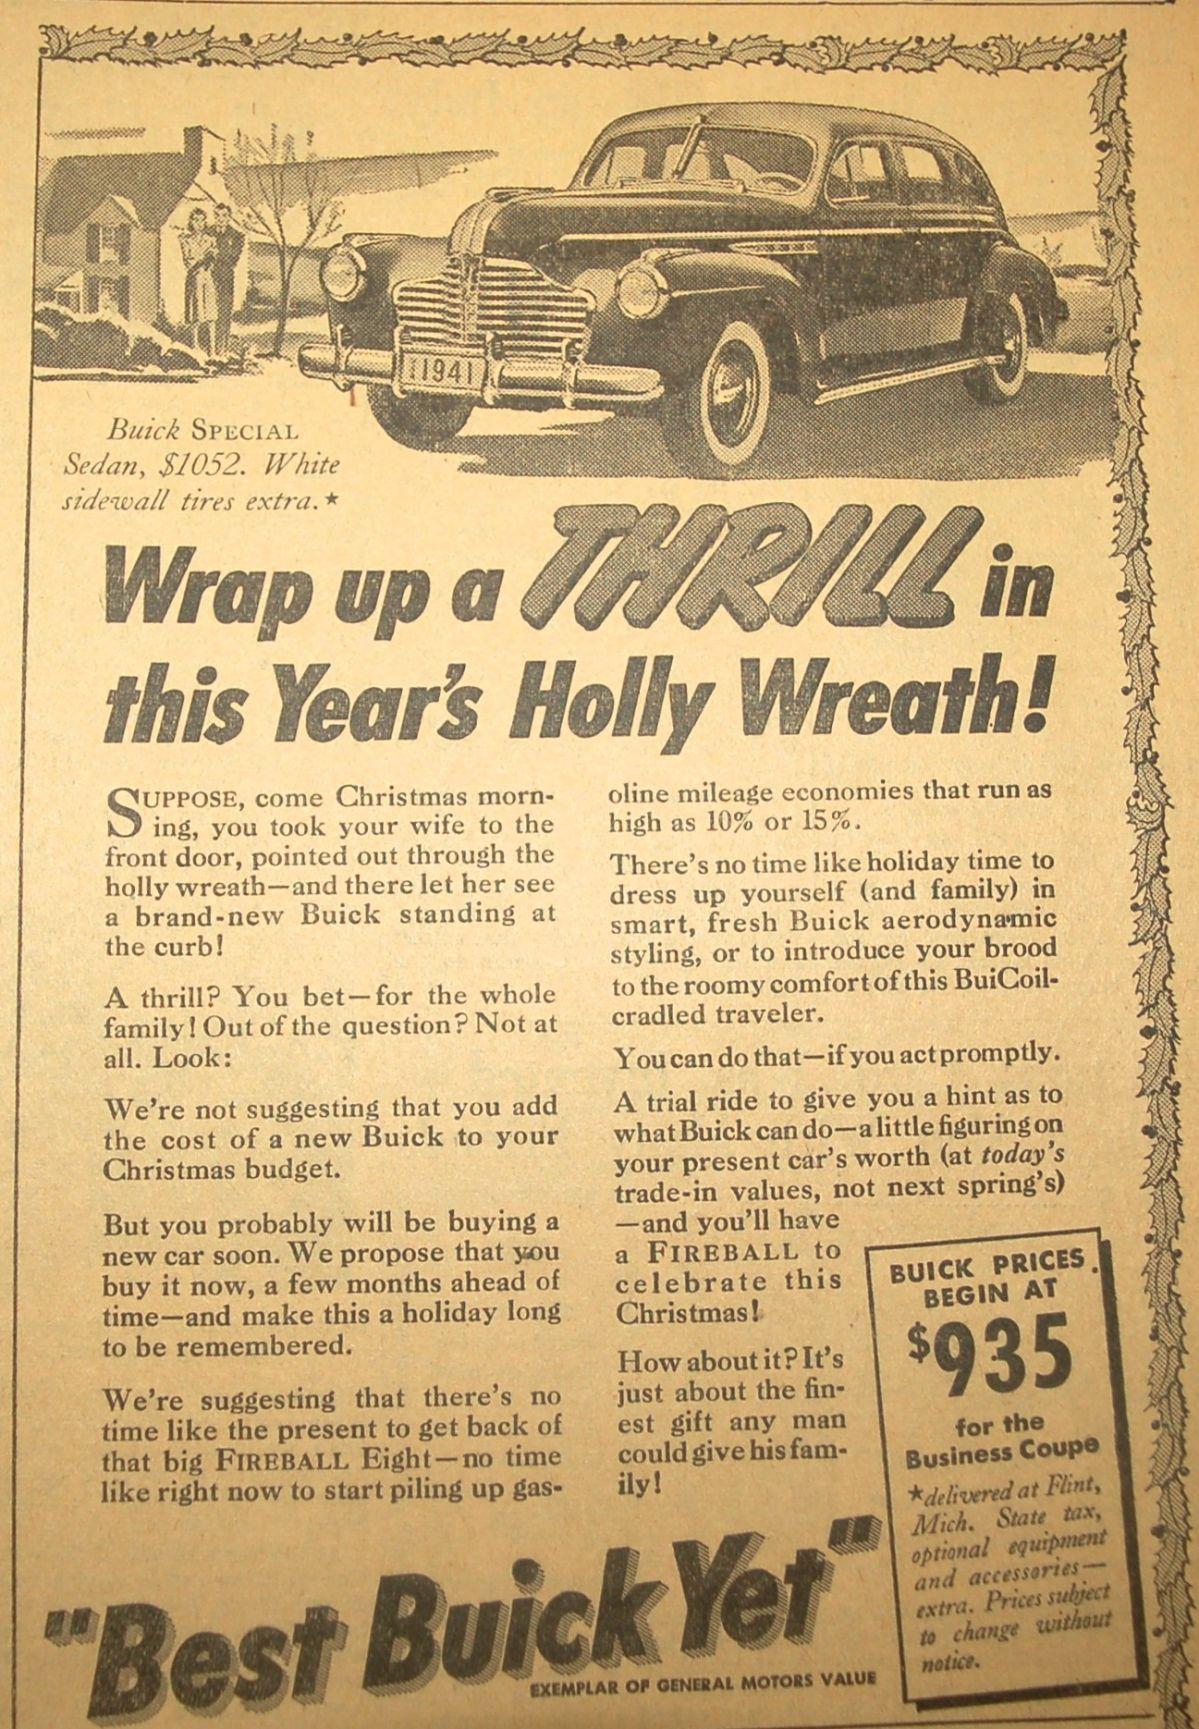 Buick advertisement